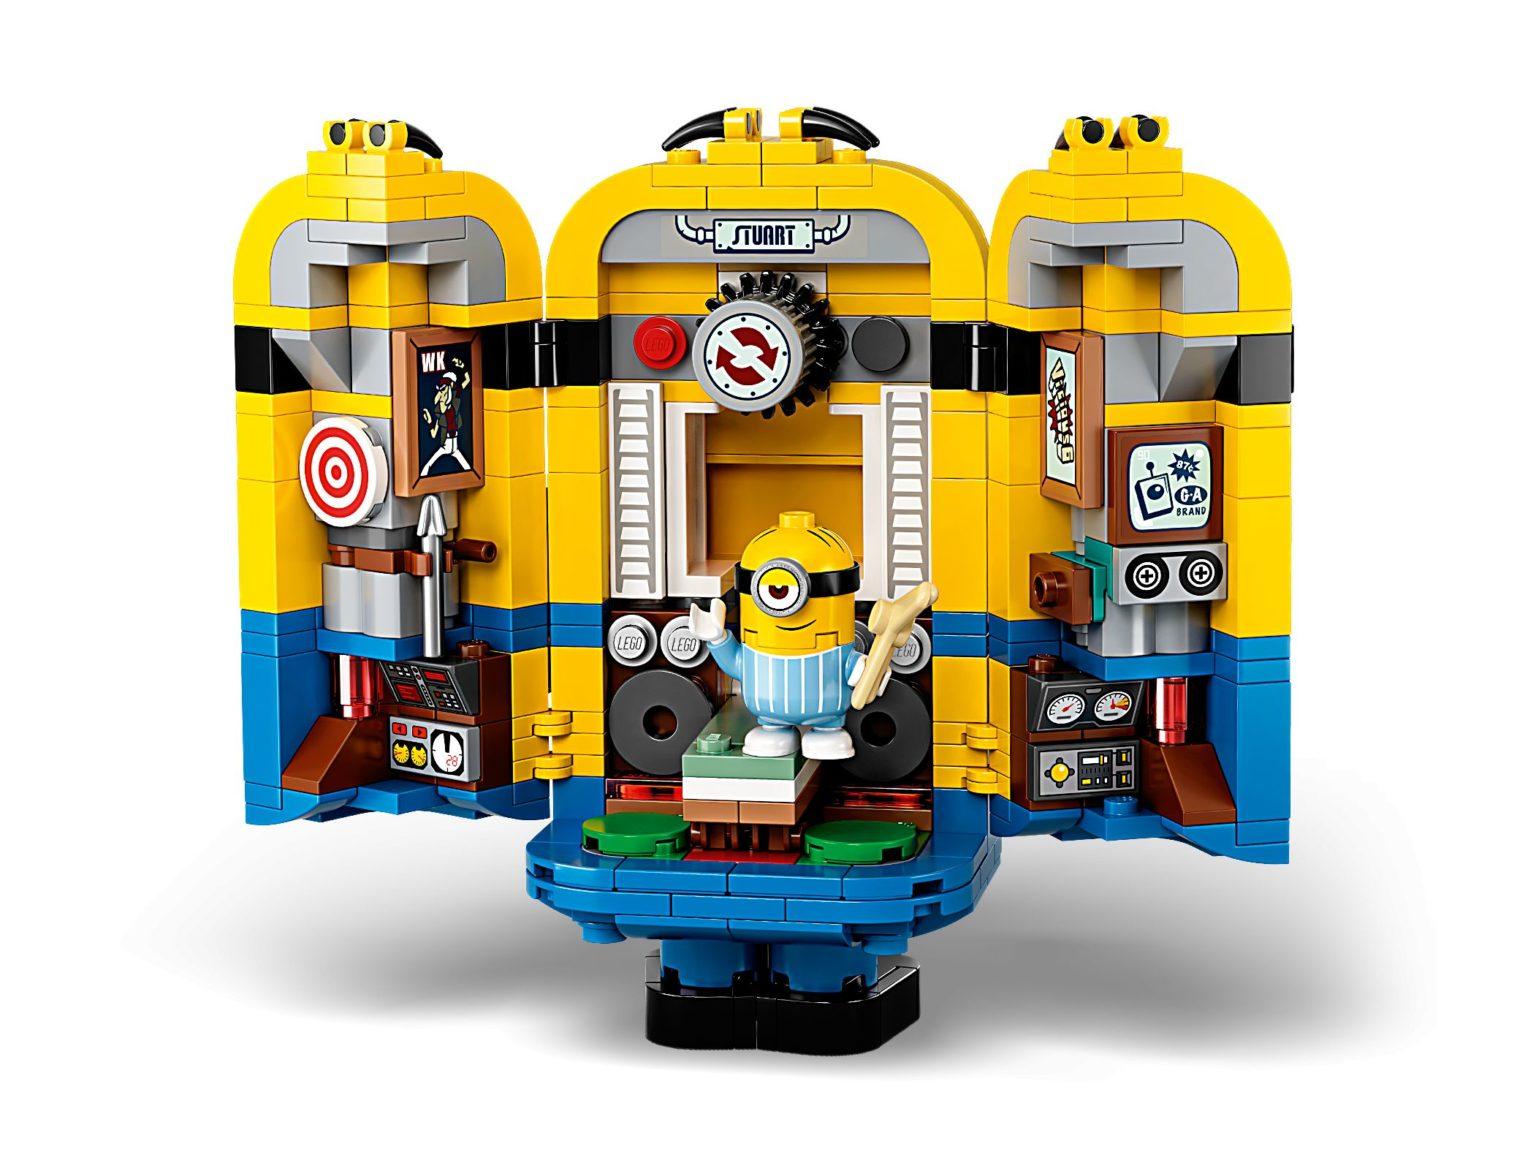 LEGO_75551_alt6